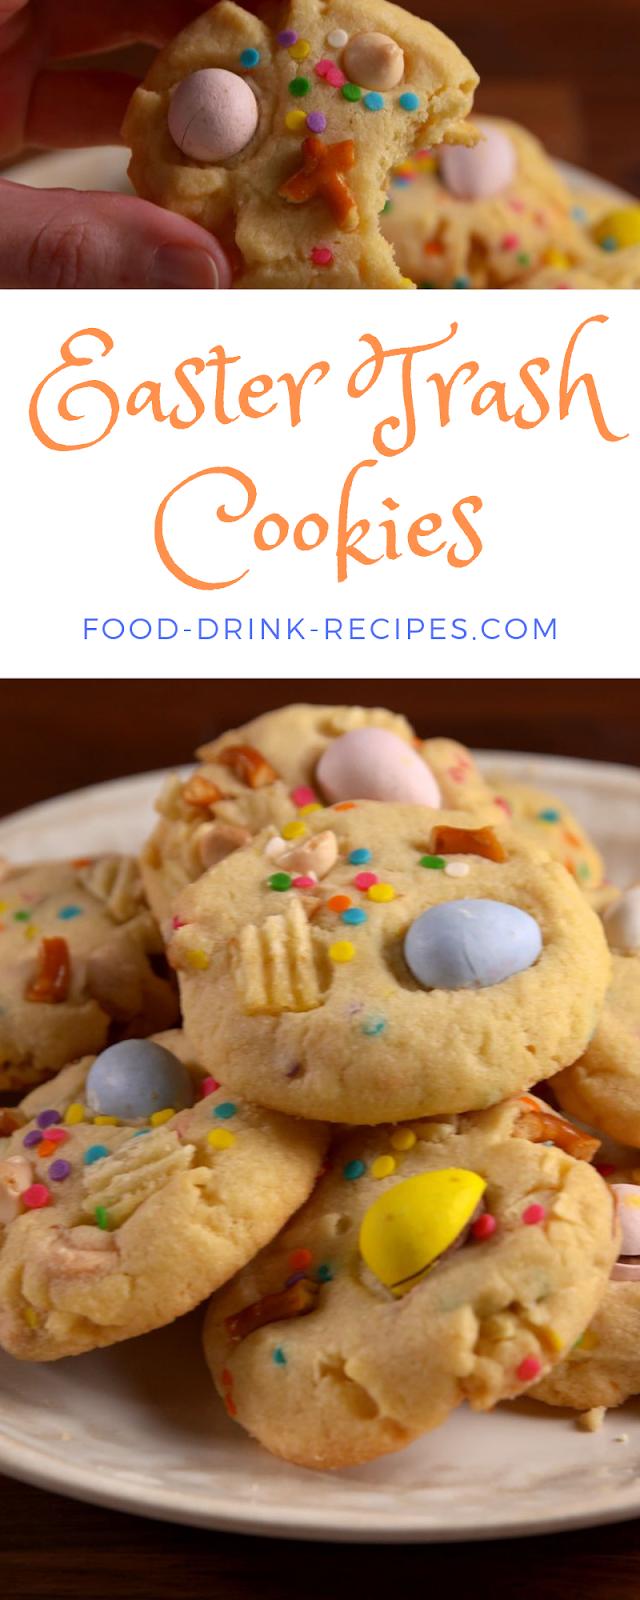 Easter Trash Cookies - food-drink-recipes.com